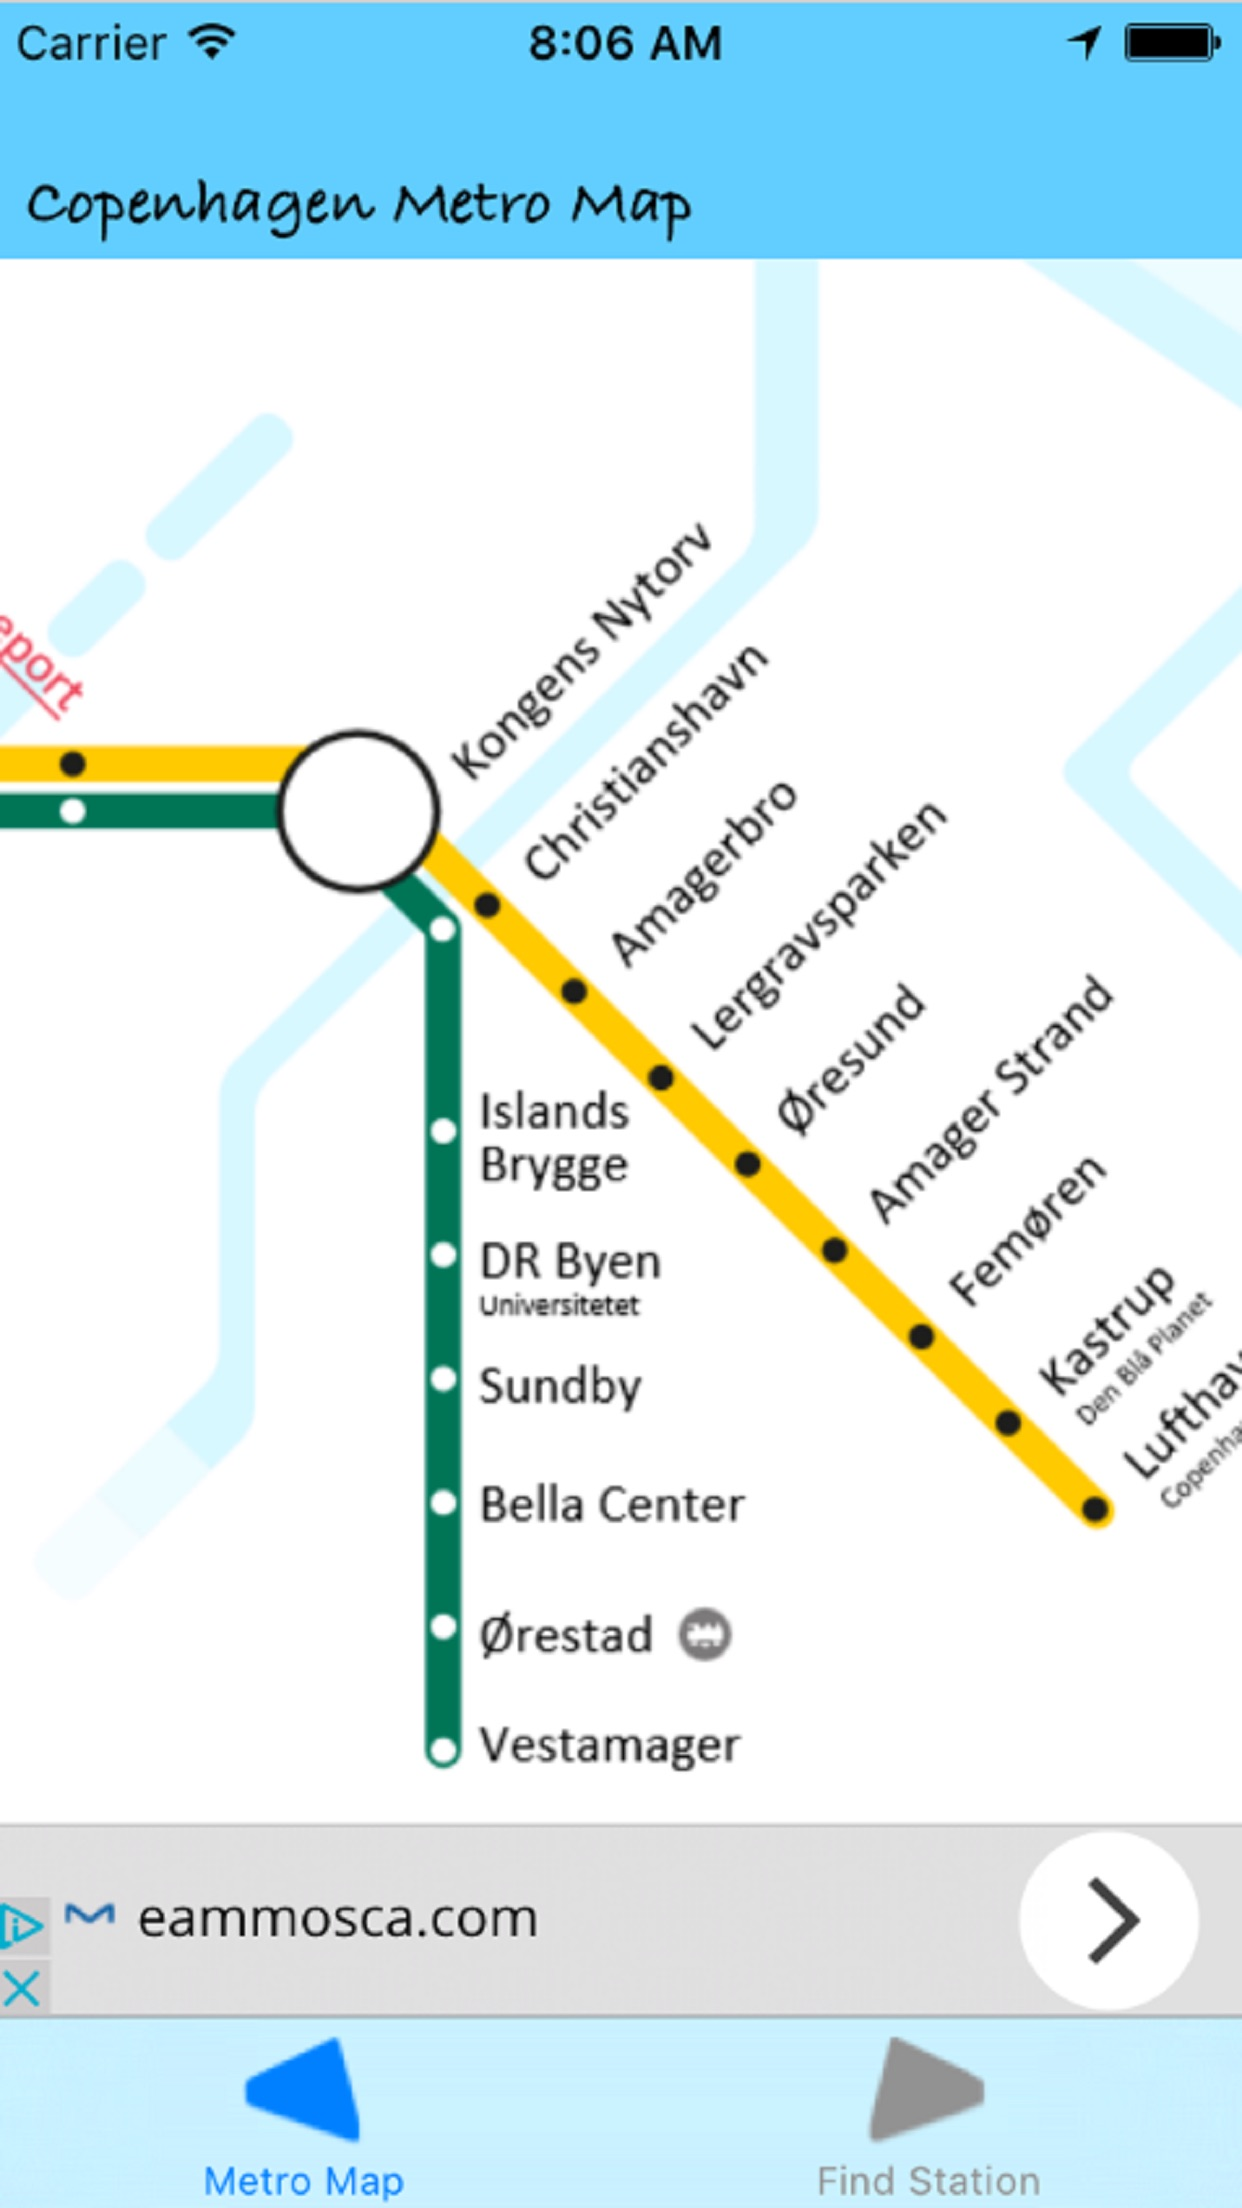 Copenhagen Metro Map Screenshot